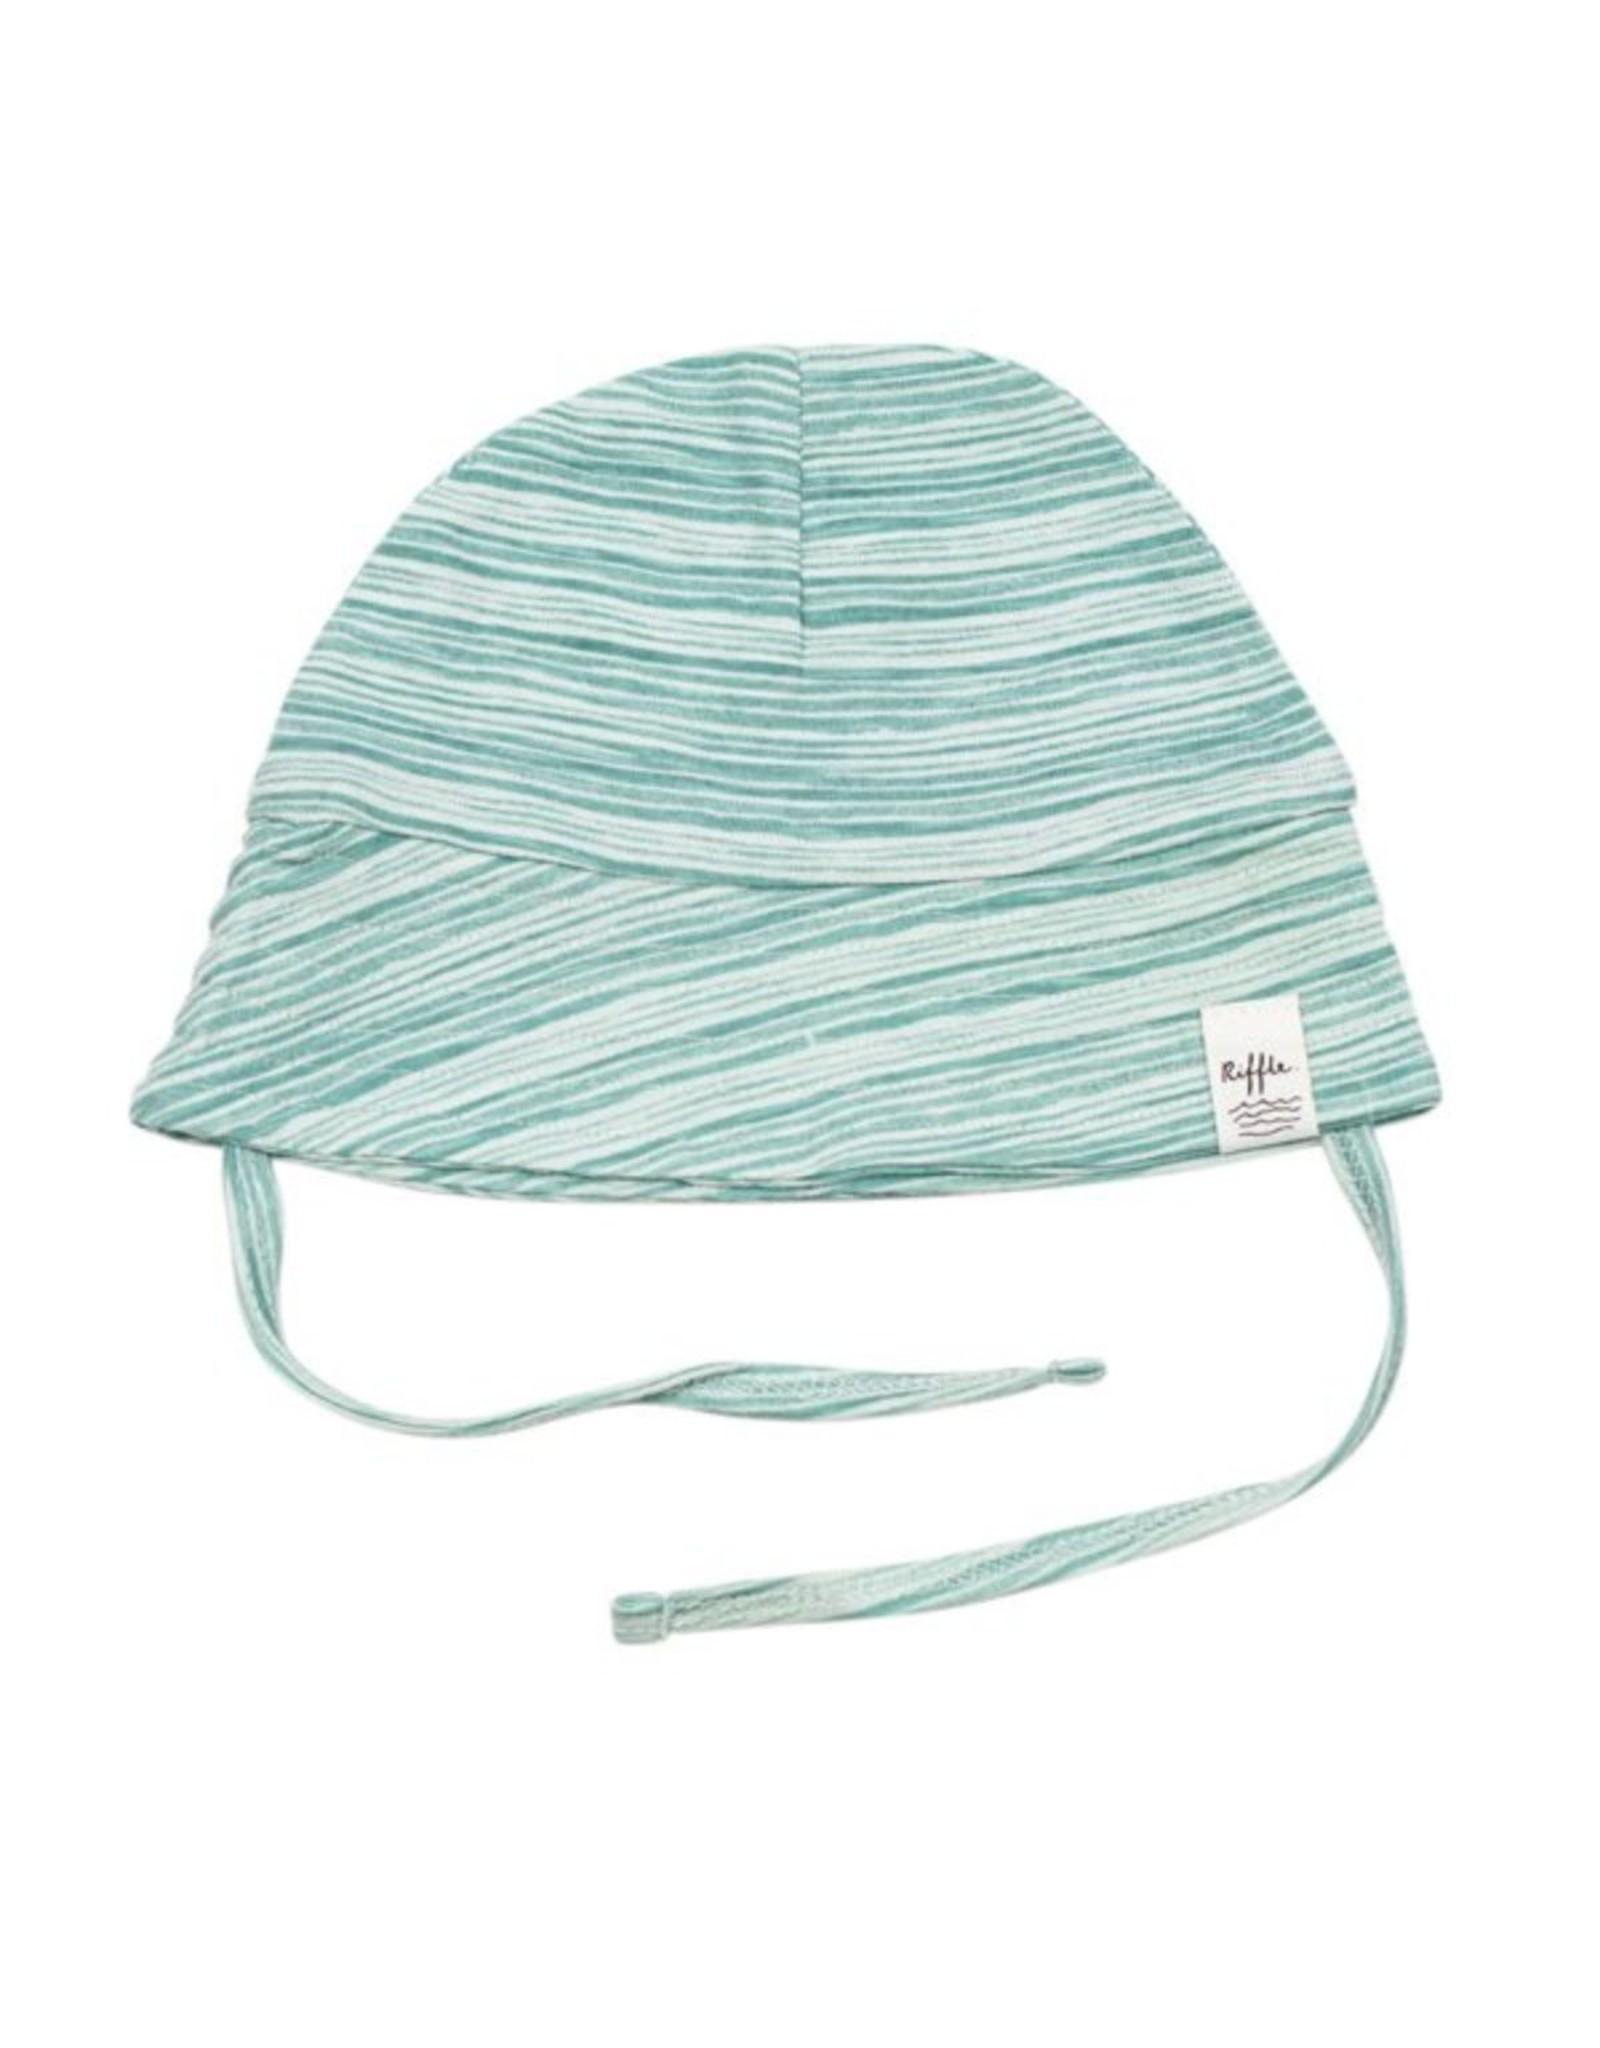 Riffle Amsterdam Riffle Amsterdam Summer Hat Stripe Green